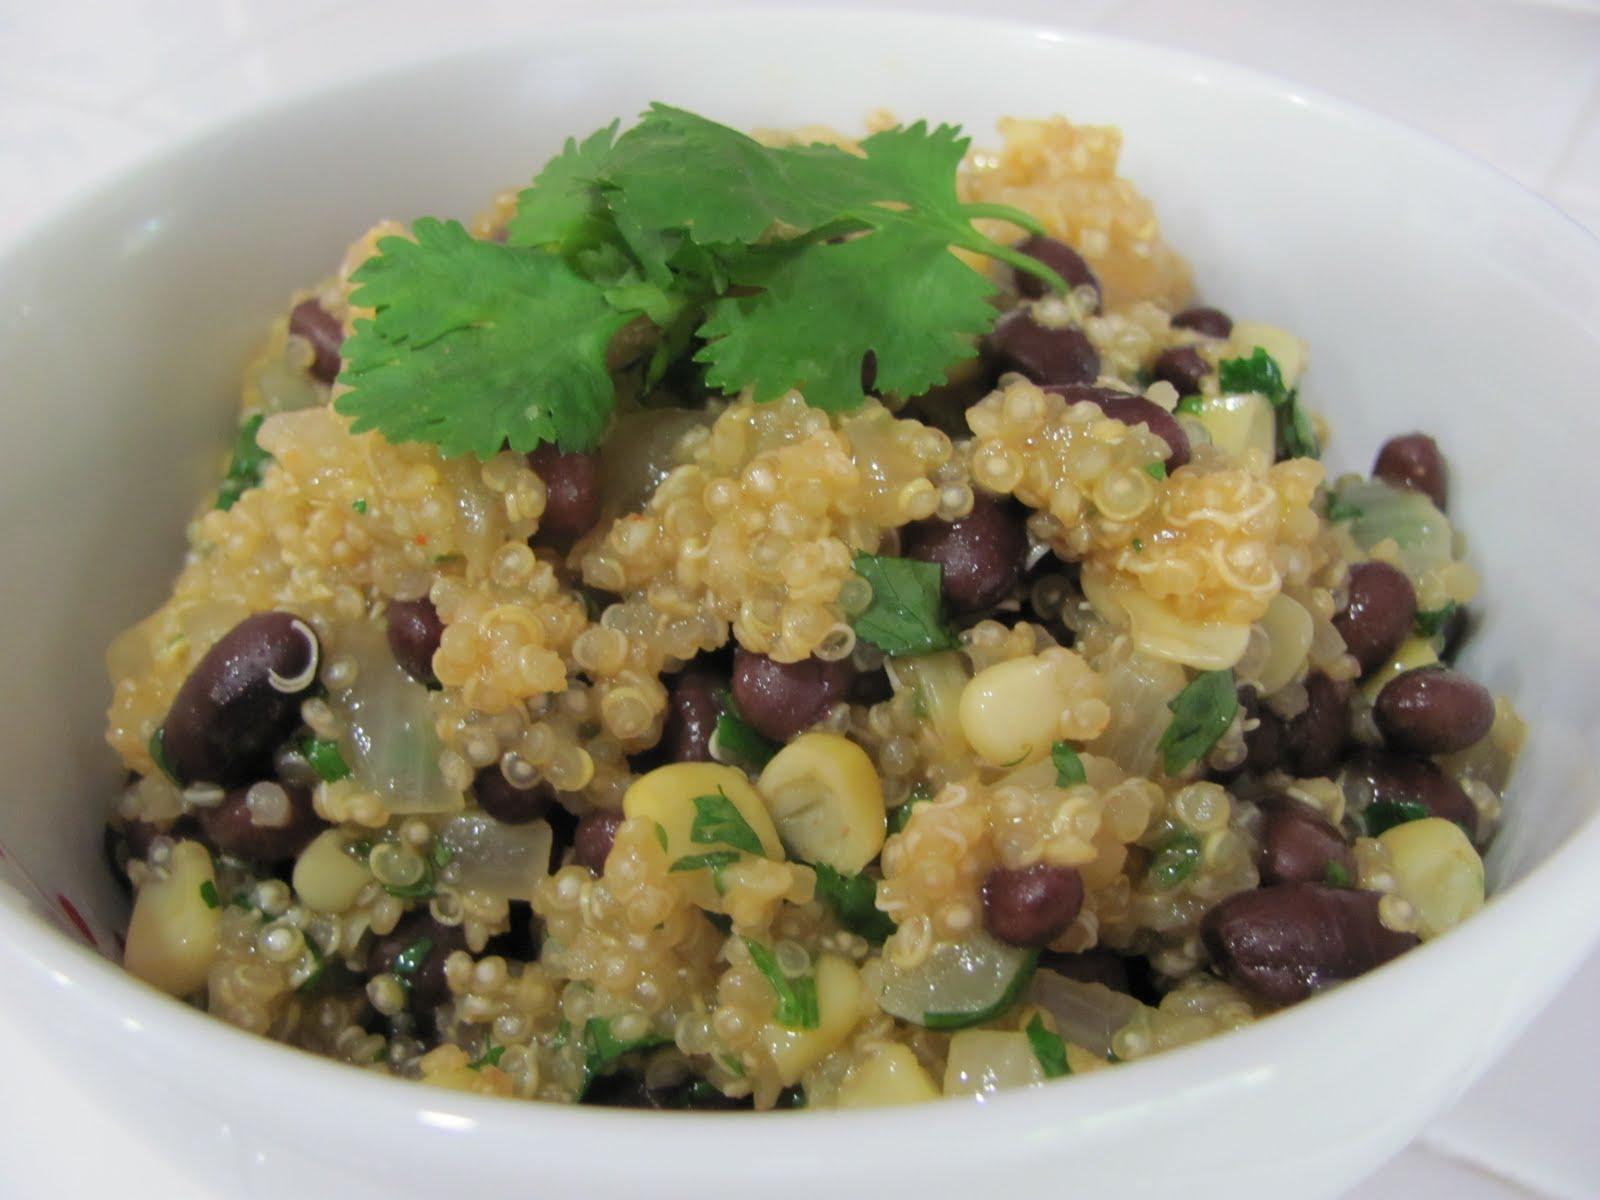 Running Upward: Quinoa and Black Beans (GREAT Make-Ahead Lunch Idea!)